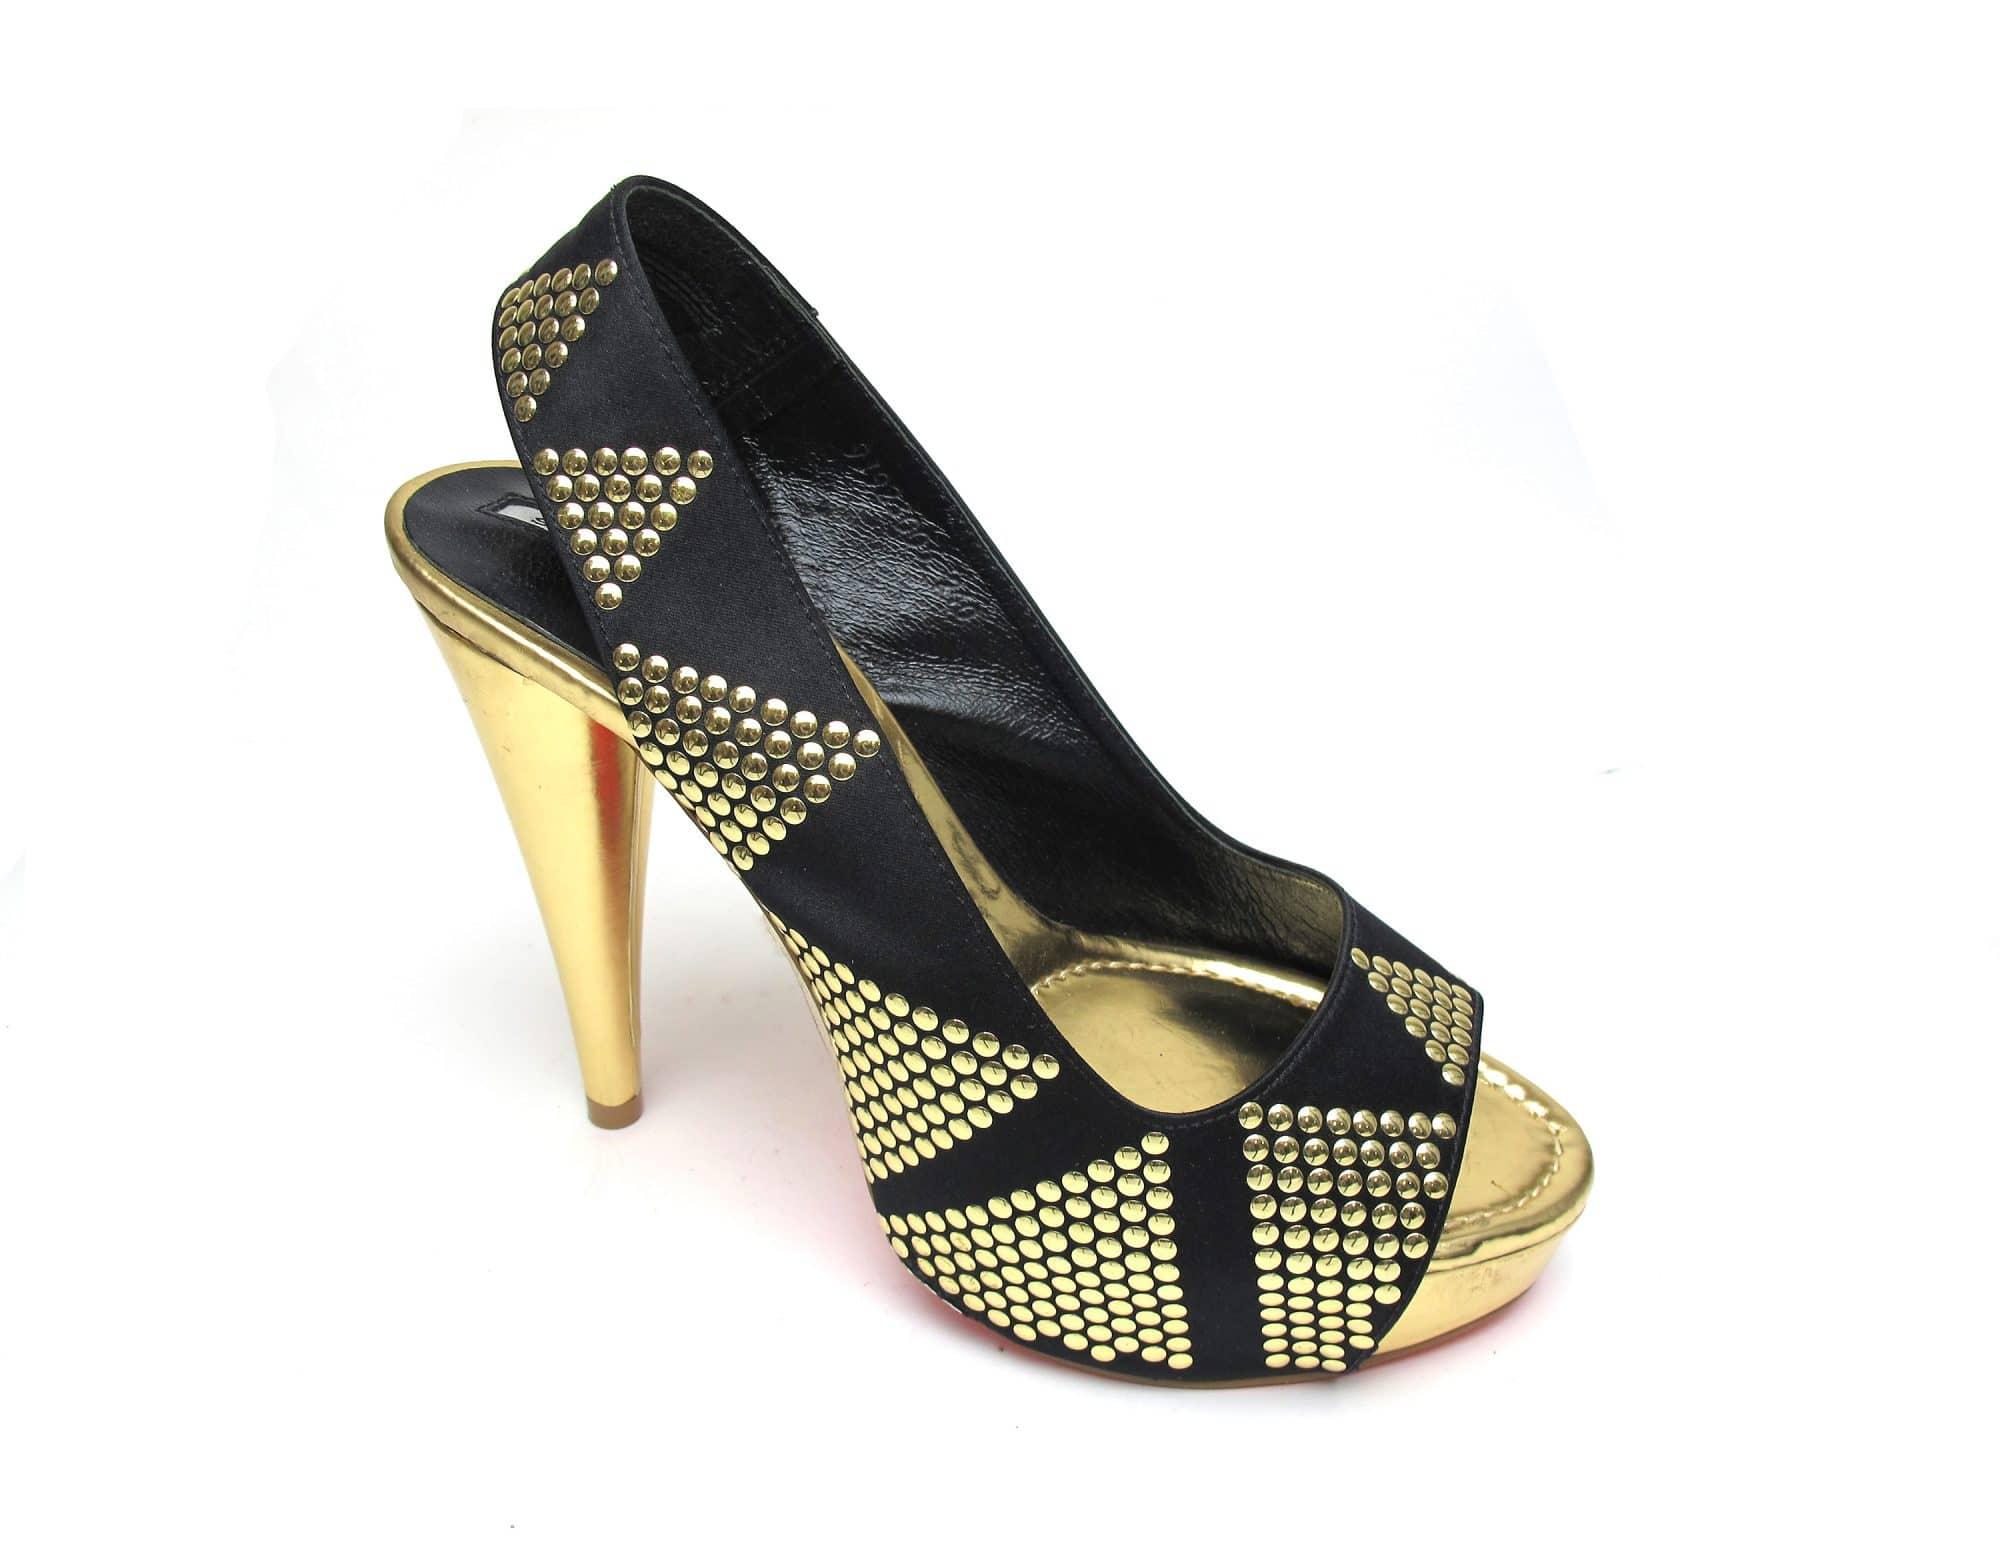 Suecomma Bonnie Black and Gold stud sling-back platform heels